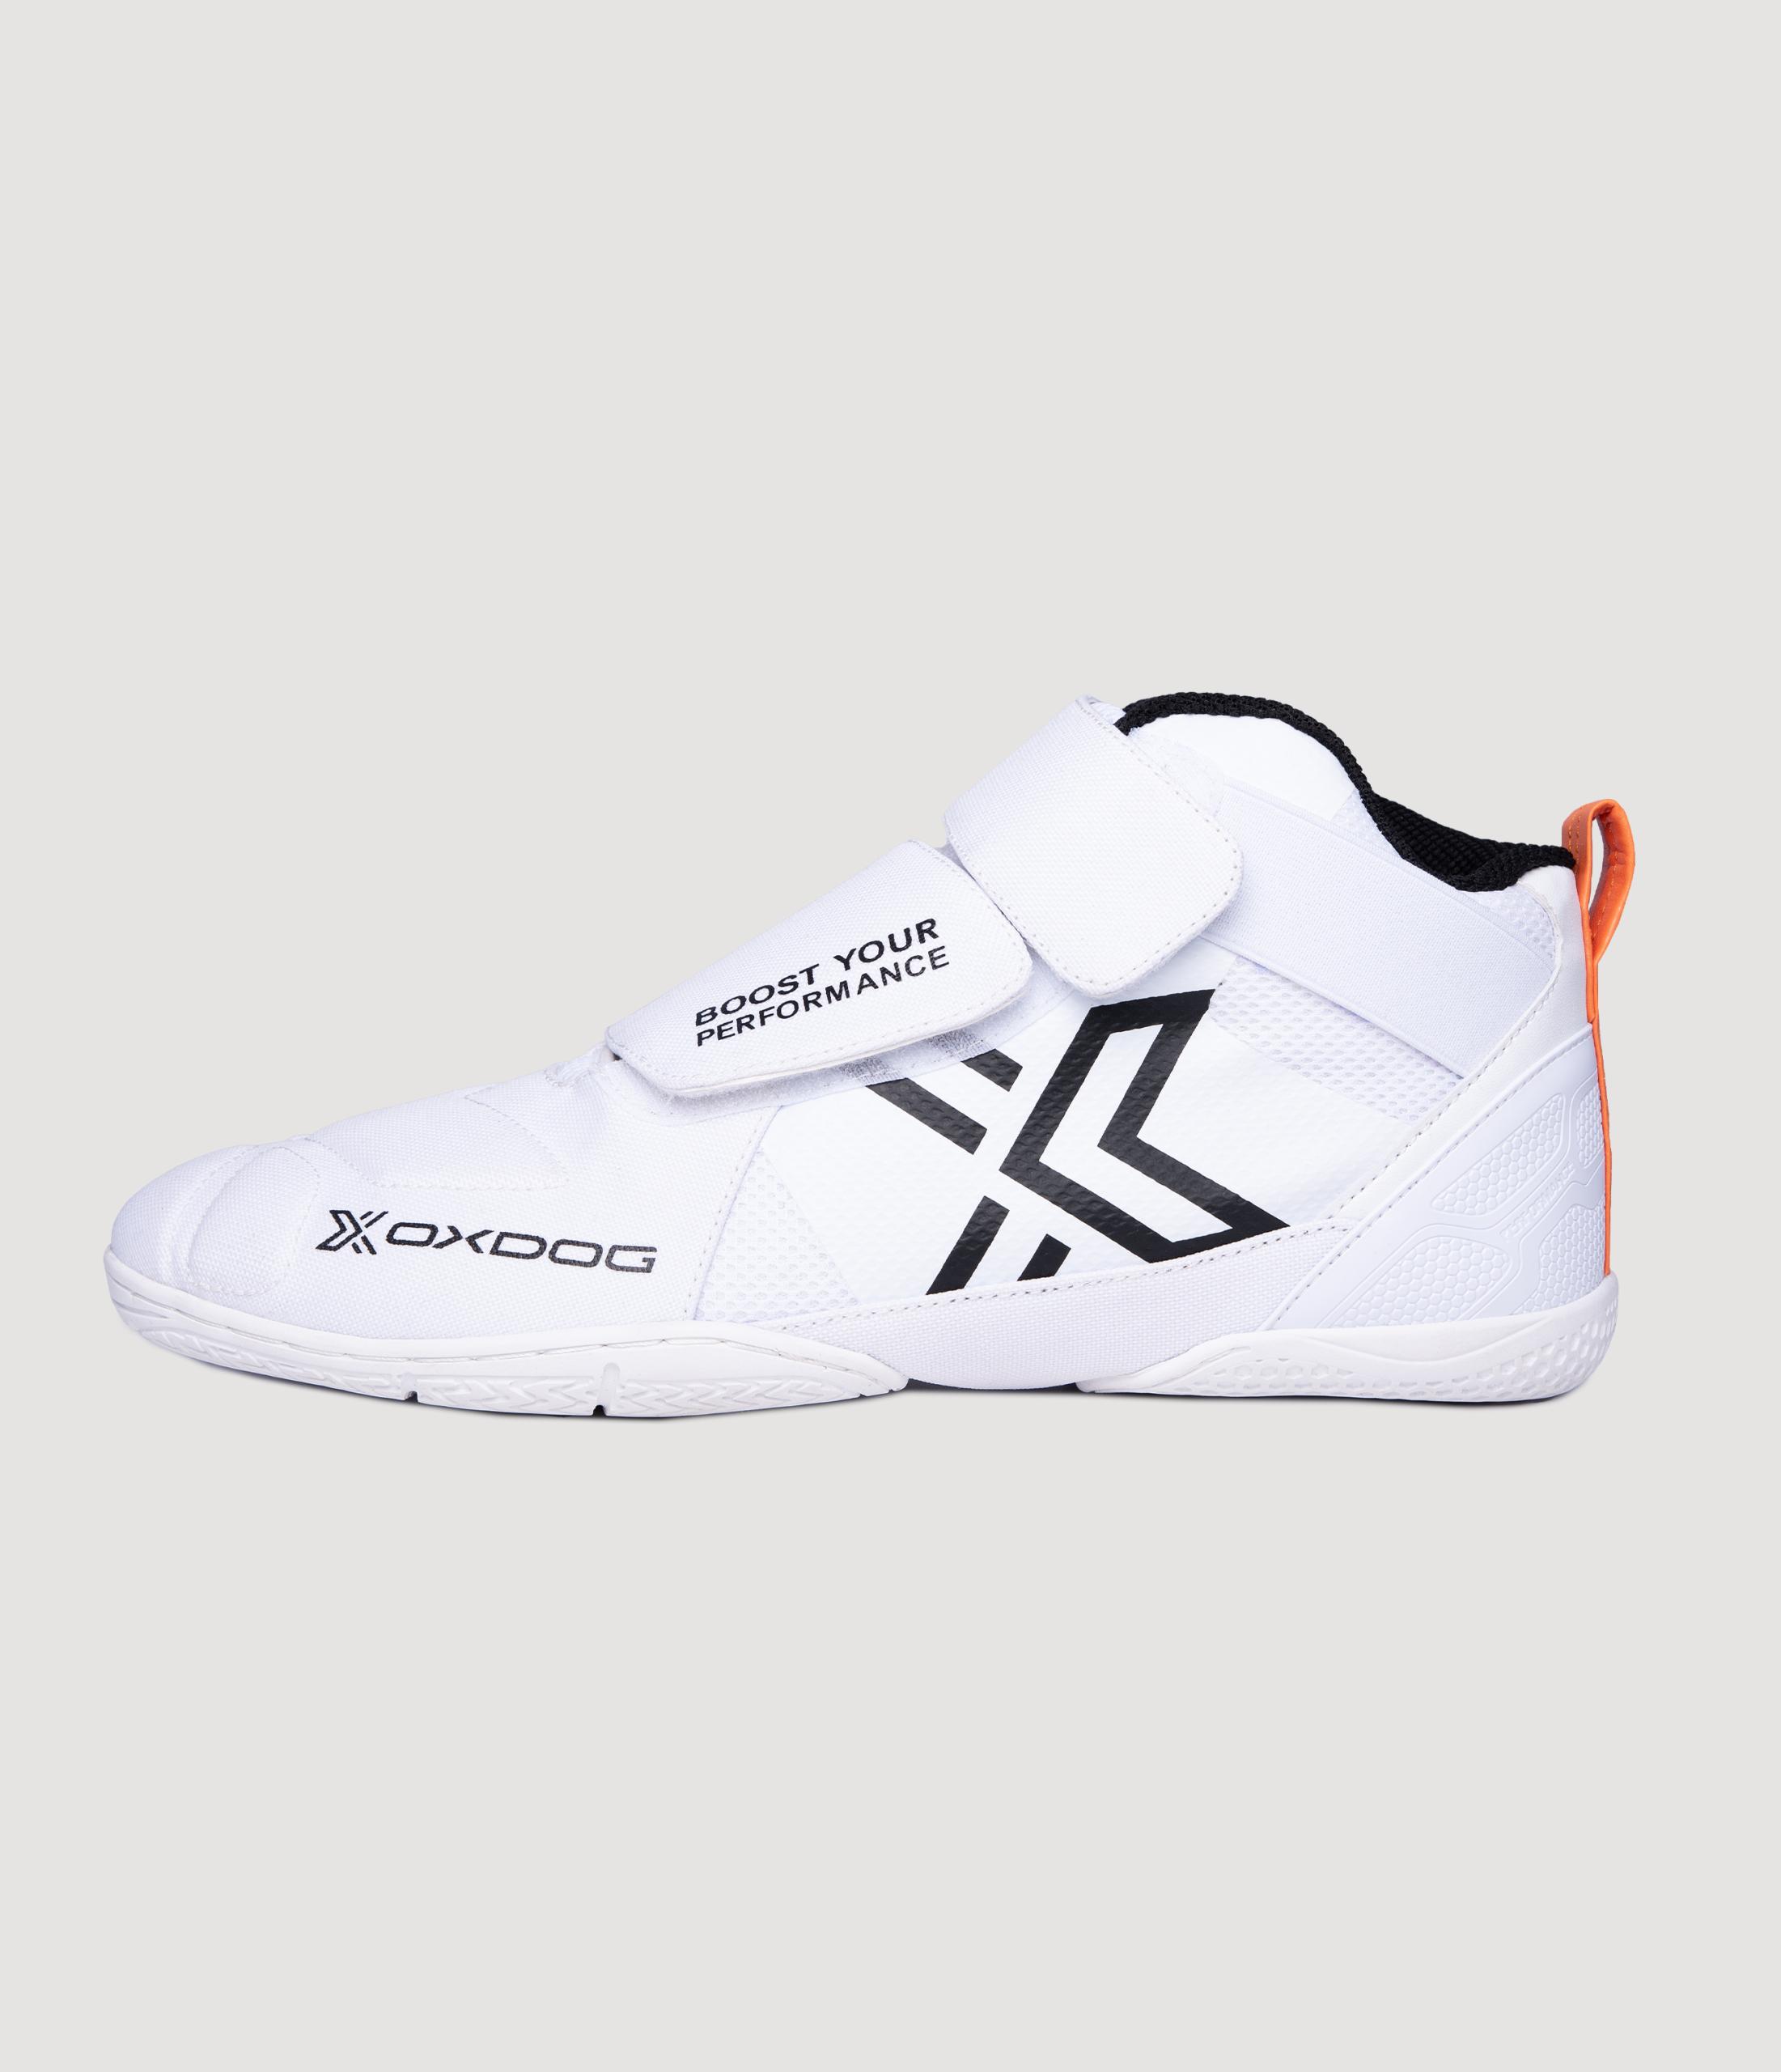 XGuard Lightflex Goalie Shoe